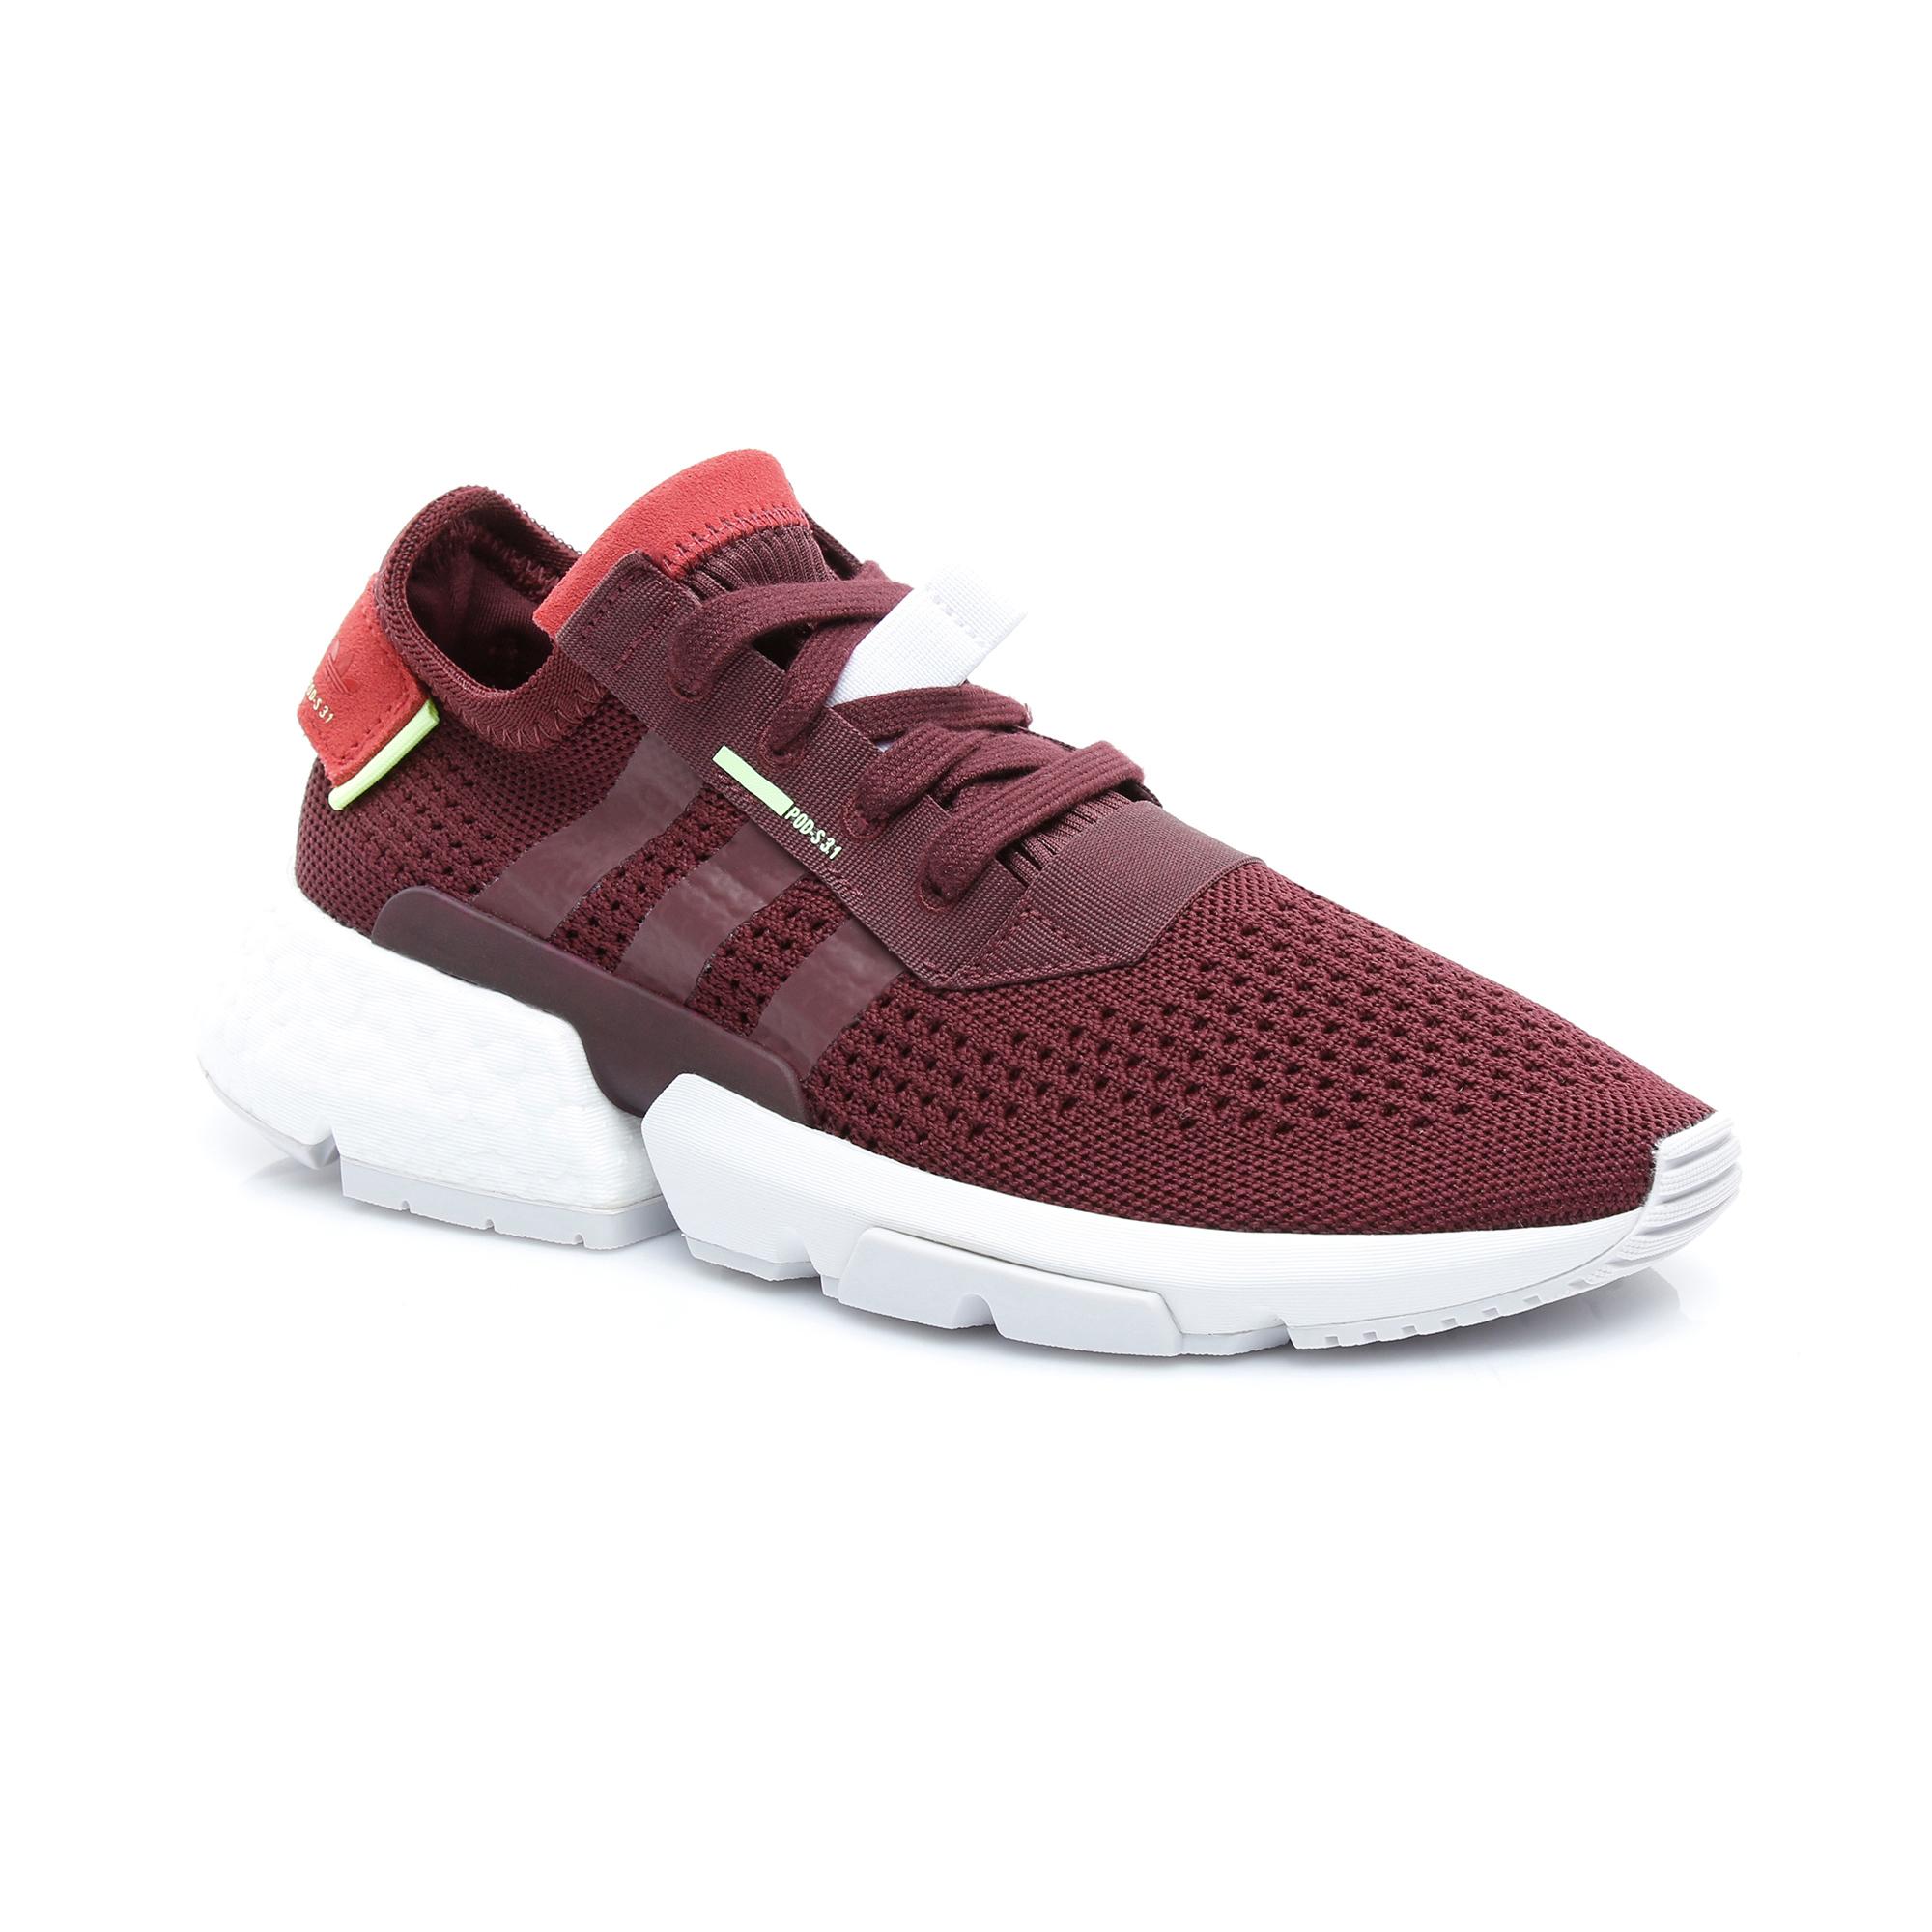 adidas Originals Pod-S3.1 Kadın Bordo Spor Ayakkabı